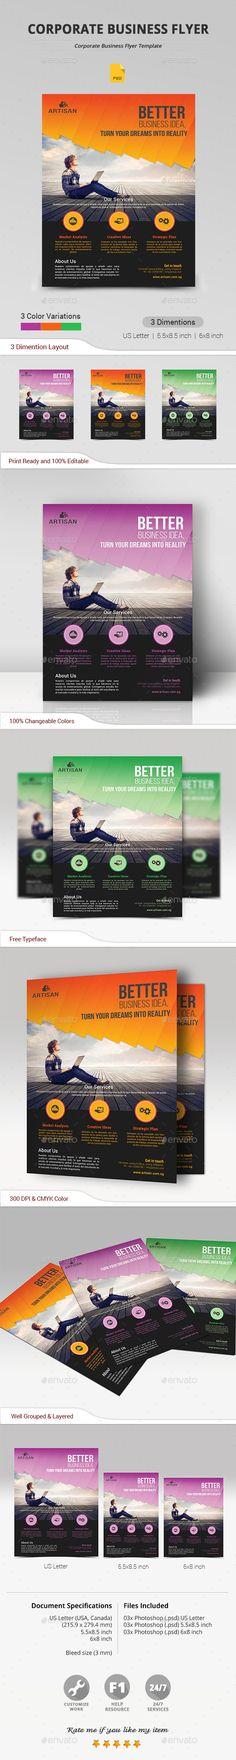 Conference Flyer Template V2 Flyers, Flyer template and Templates - conference flyer template